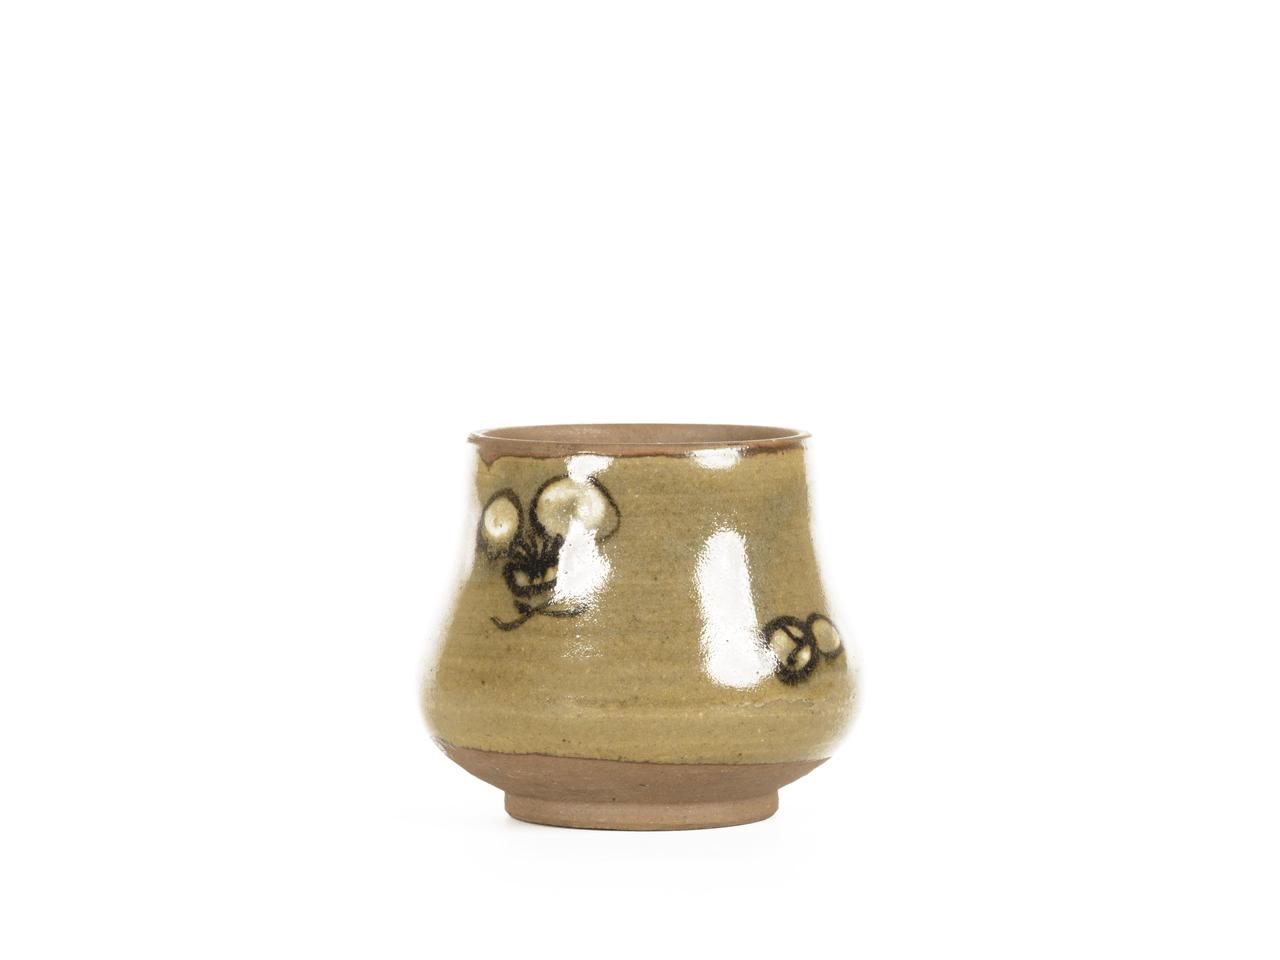 A Vintage Studio Pottery Signed Japanese Nippon Miniature Vase